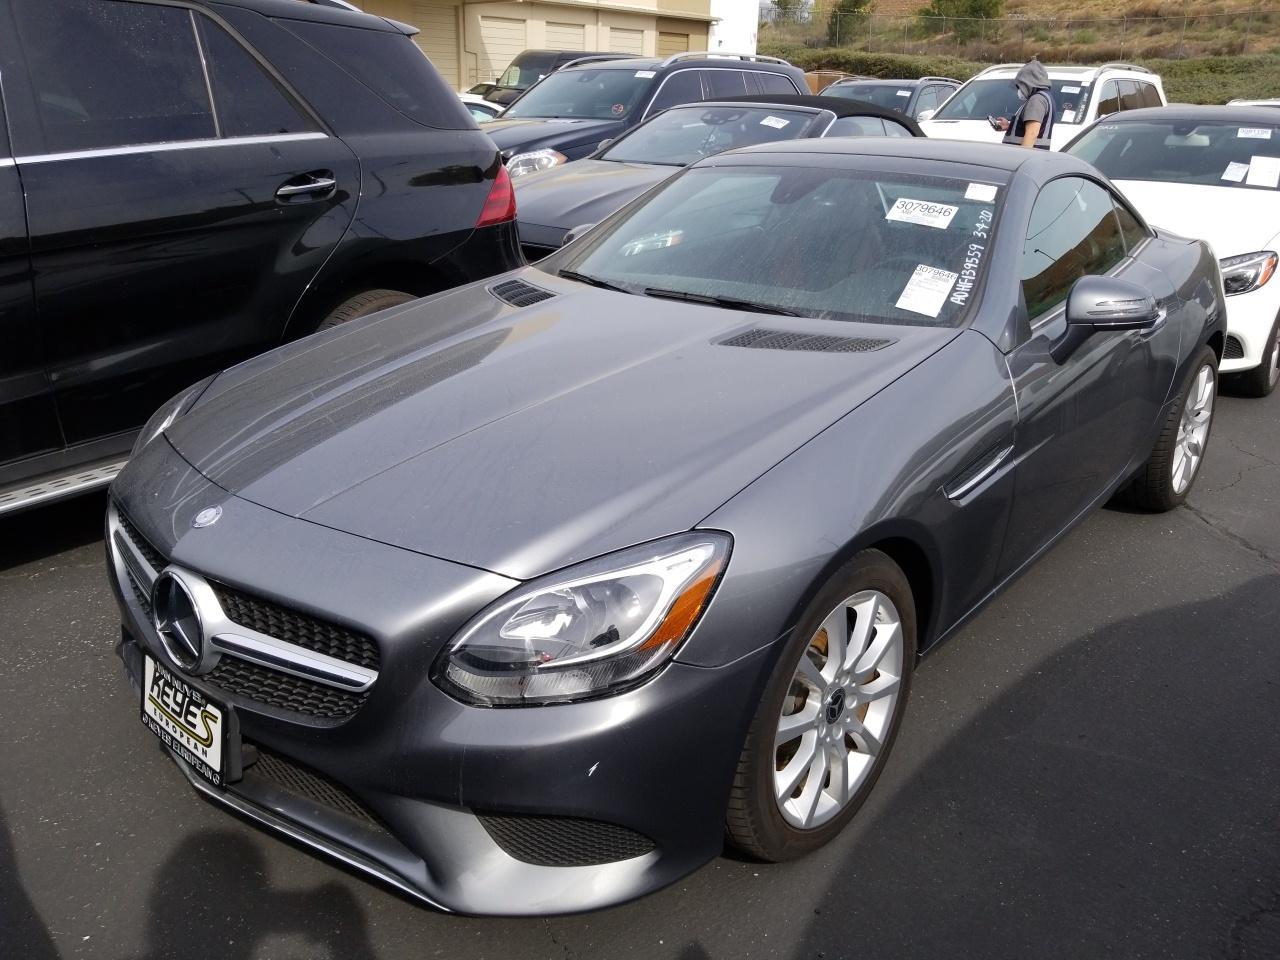 2017 Mercedes-benz SLC 2.0. Lot 99913796674 Vin WDDPK3JA0HF139559